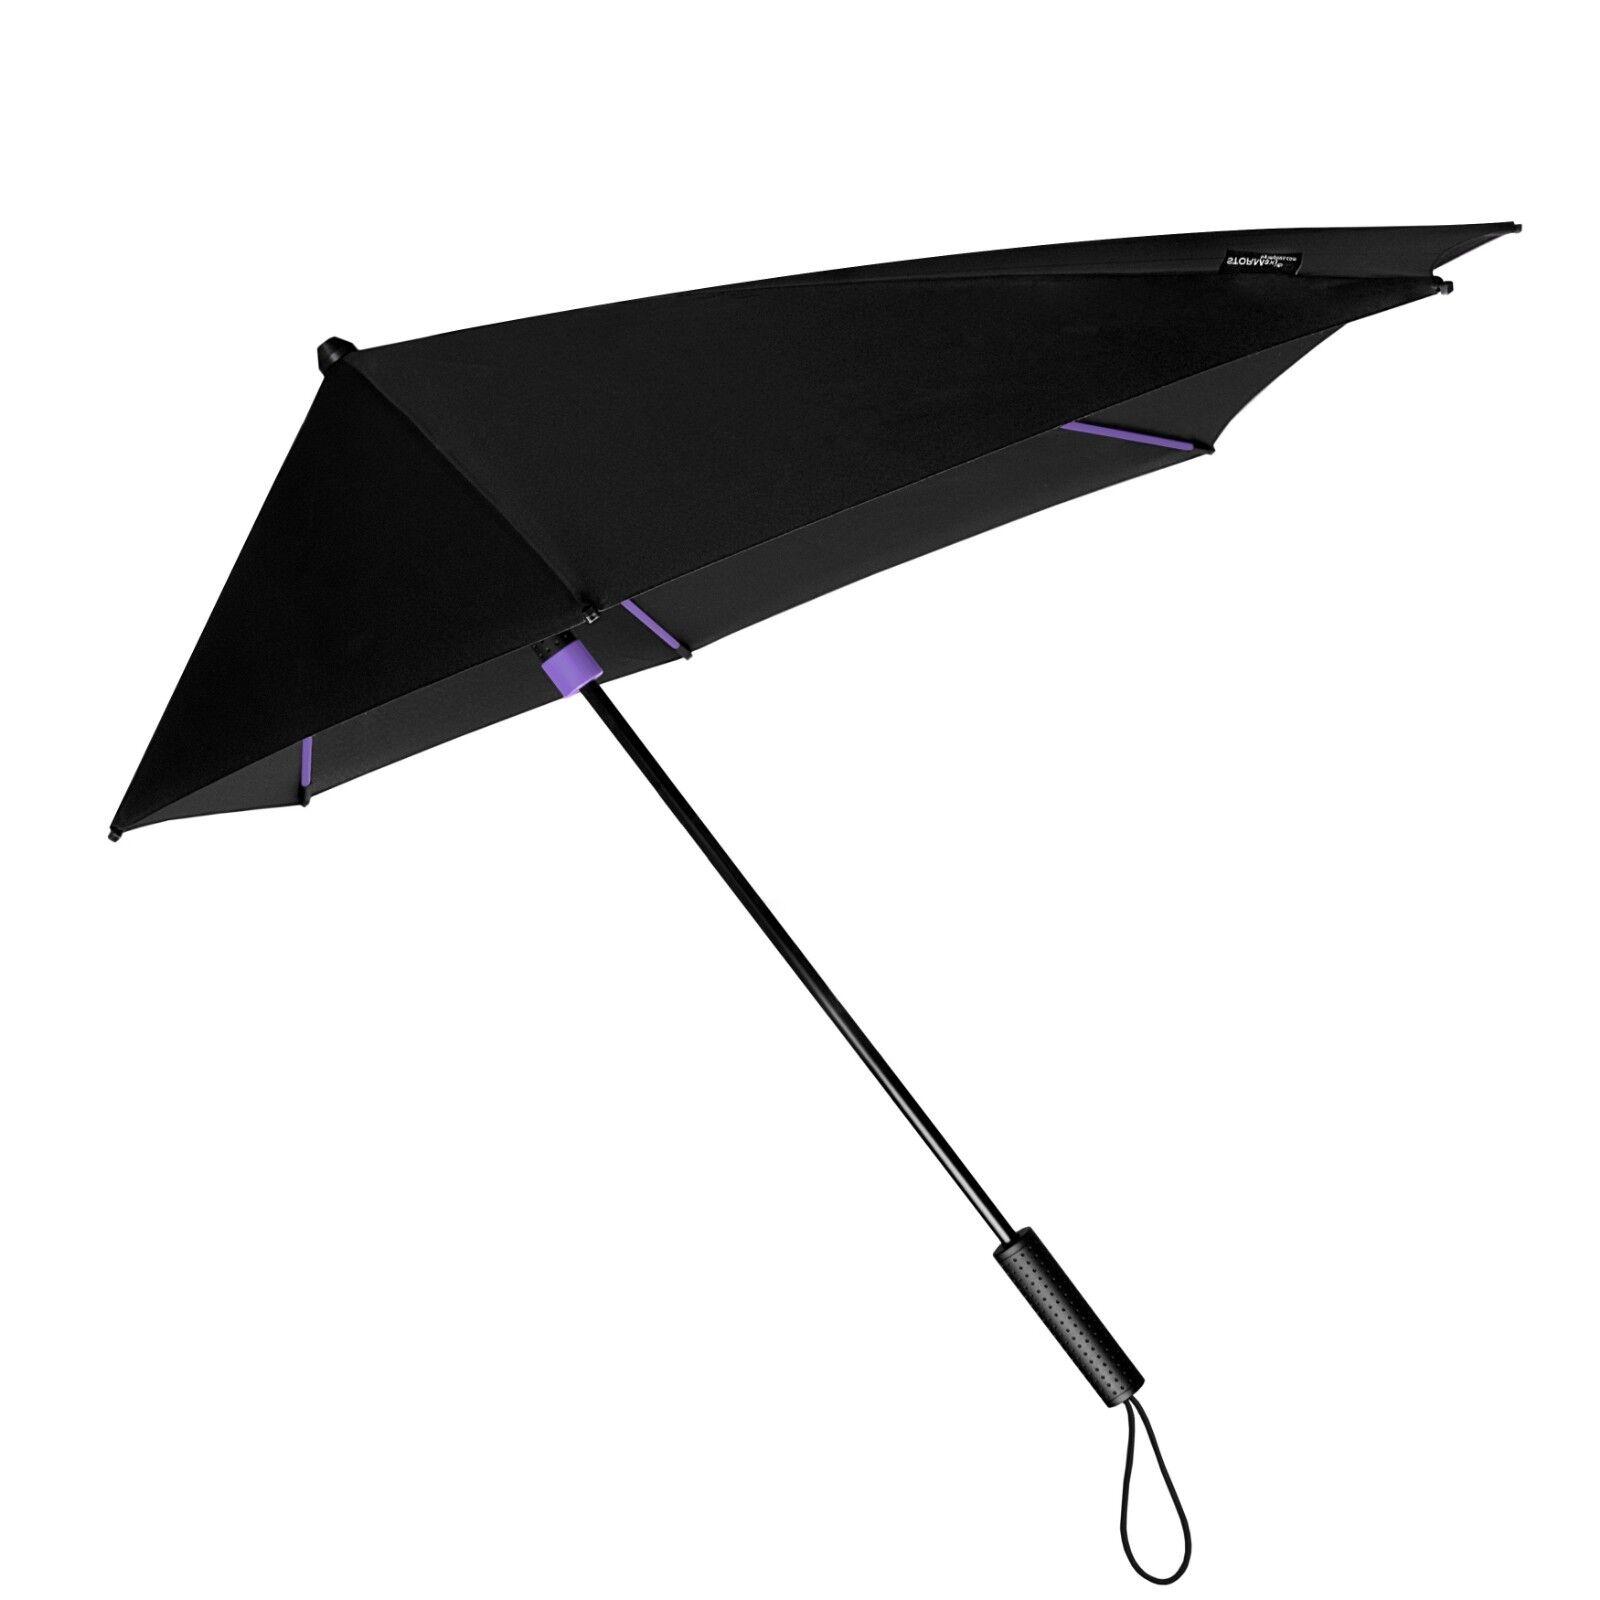 Premium Compact Windproof Umbrella Wind Vented Canopy /& 10 Storm Resistant Ribs